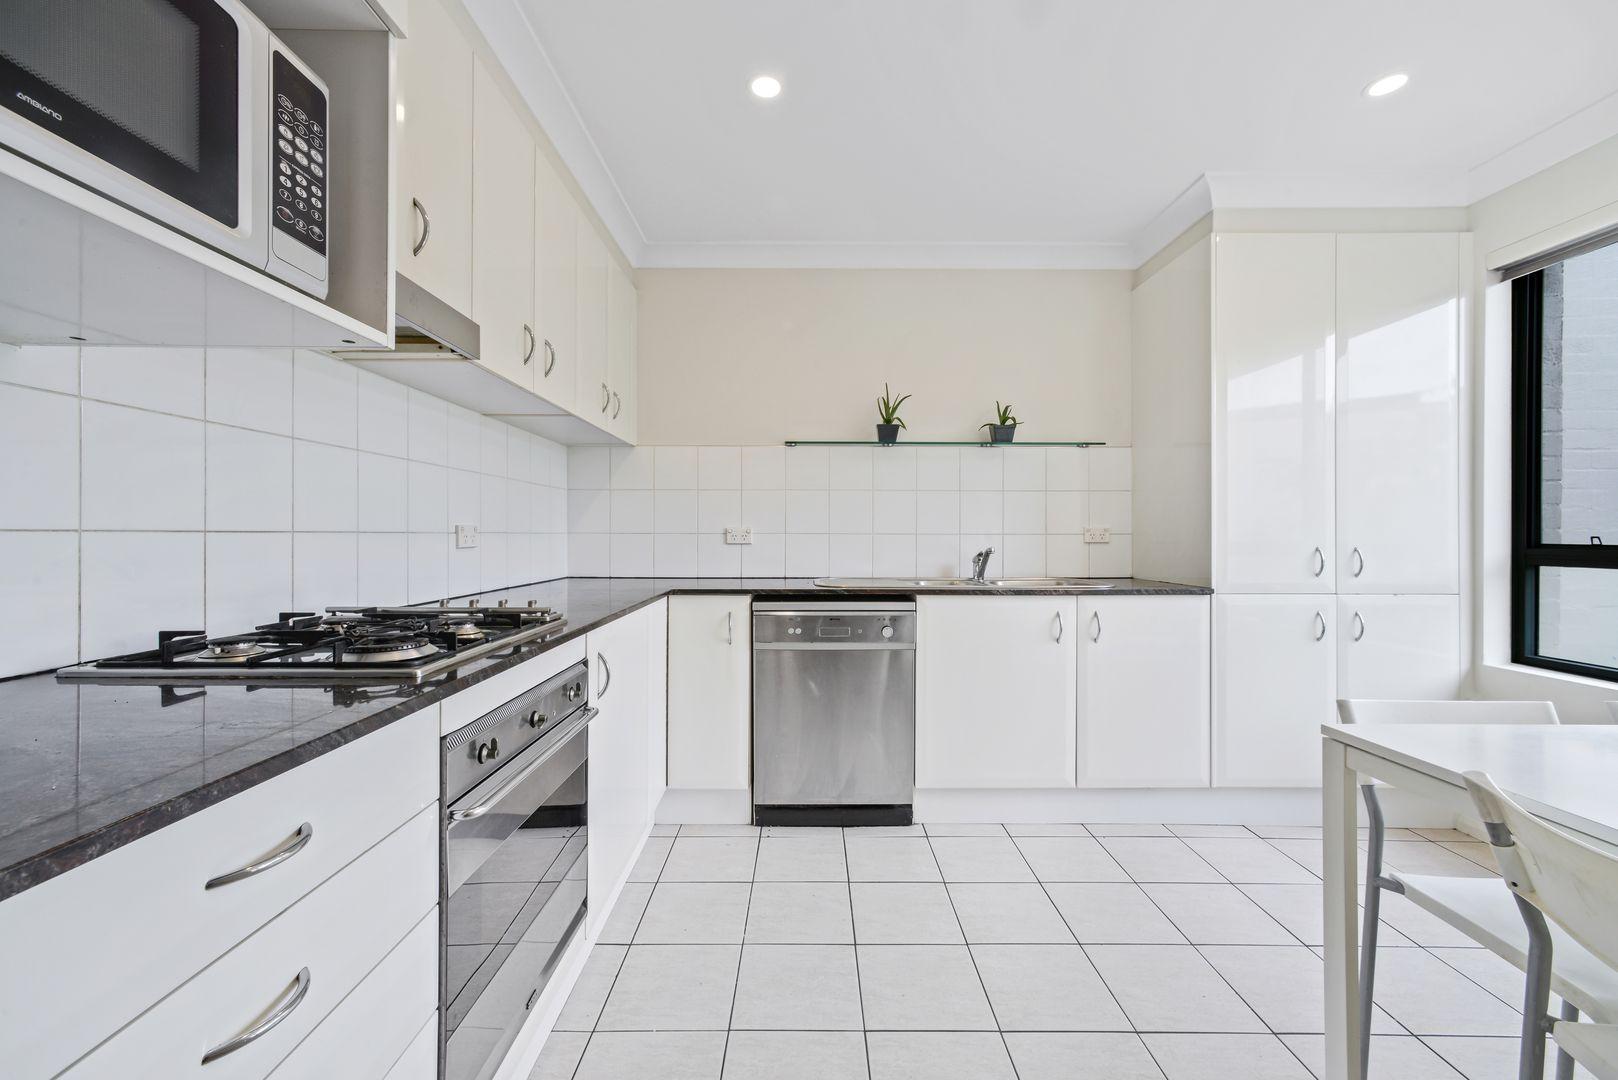 38/1 Wride Street, Maroubra NSW 2035, Image 2